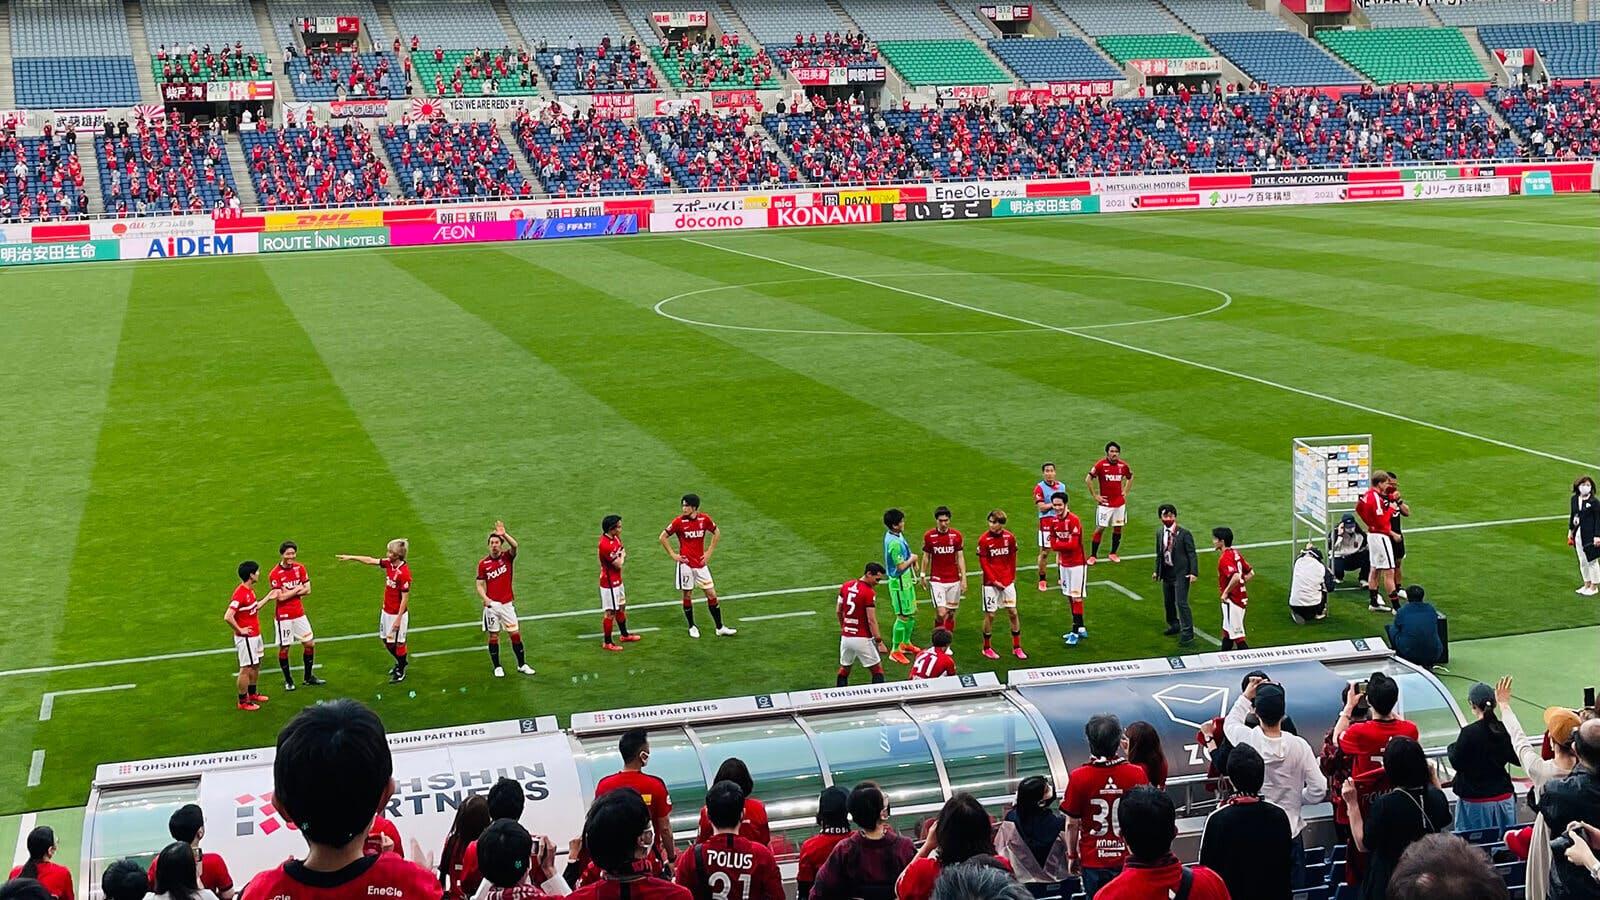 2021 Jリーグ 第13節 埼玉スタジアム2002 ベガルタ仙台戦 試合終了後